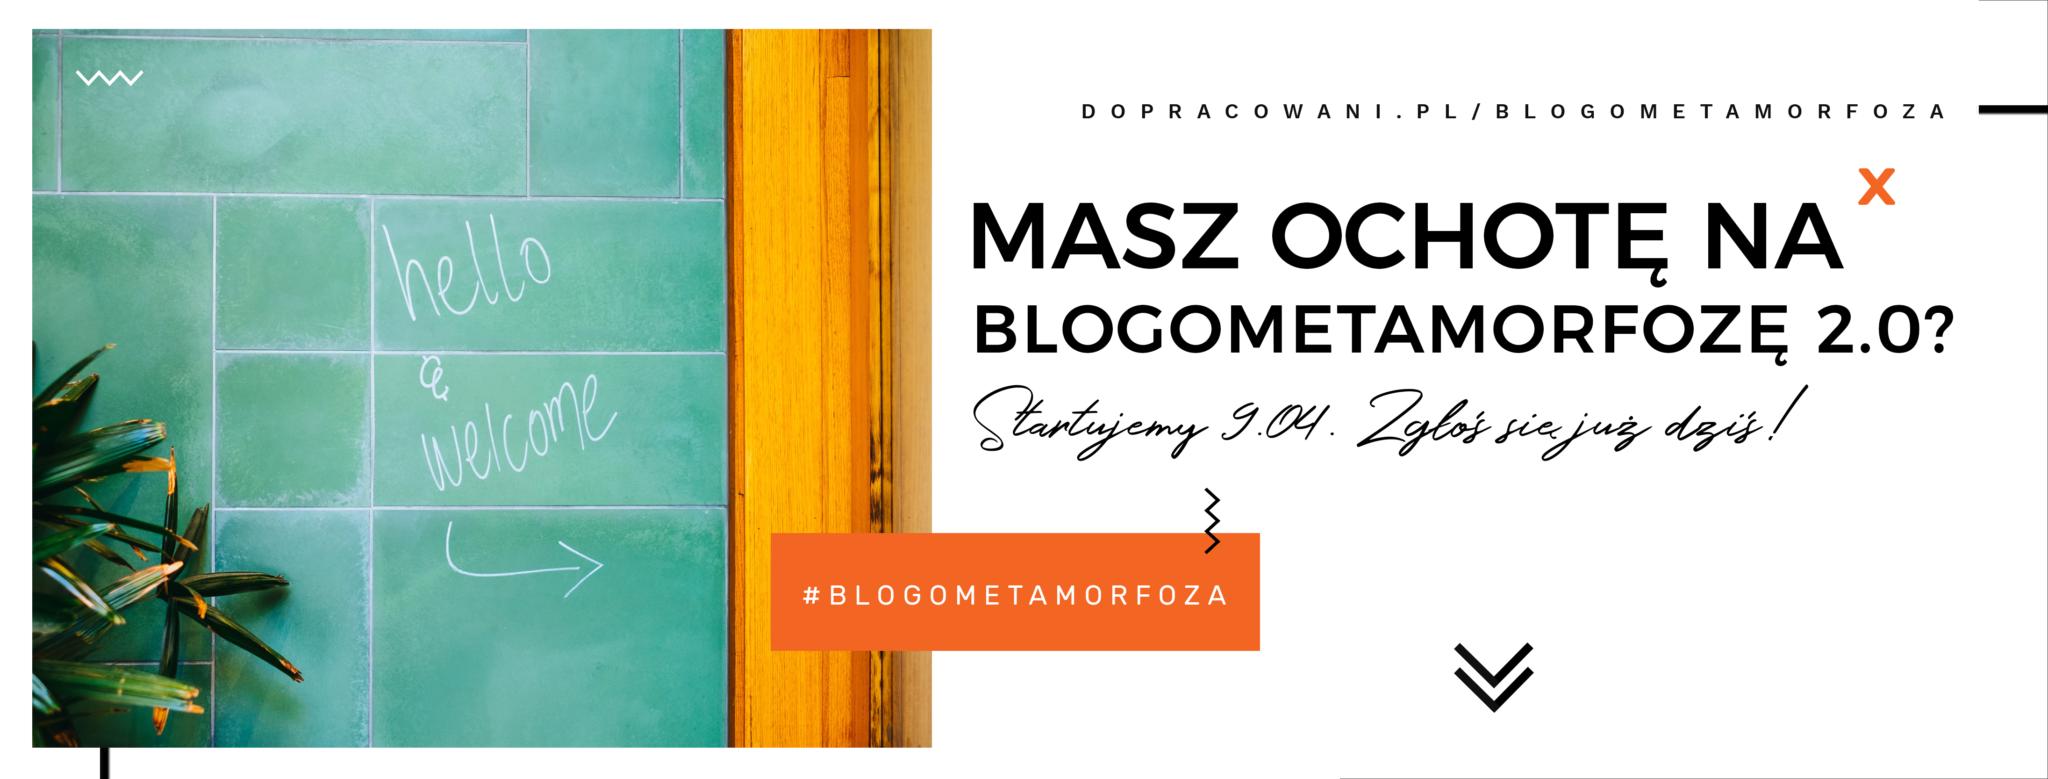 Blogometamorfoza 2.0